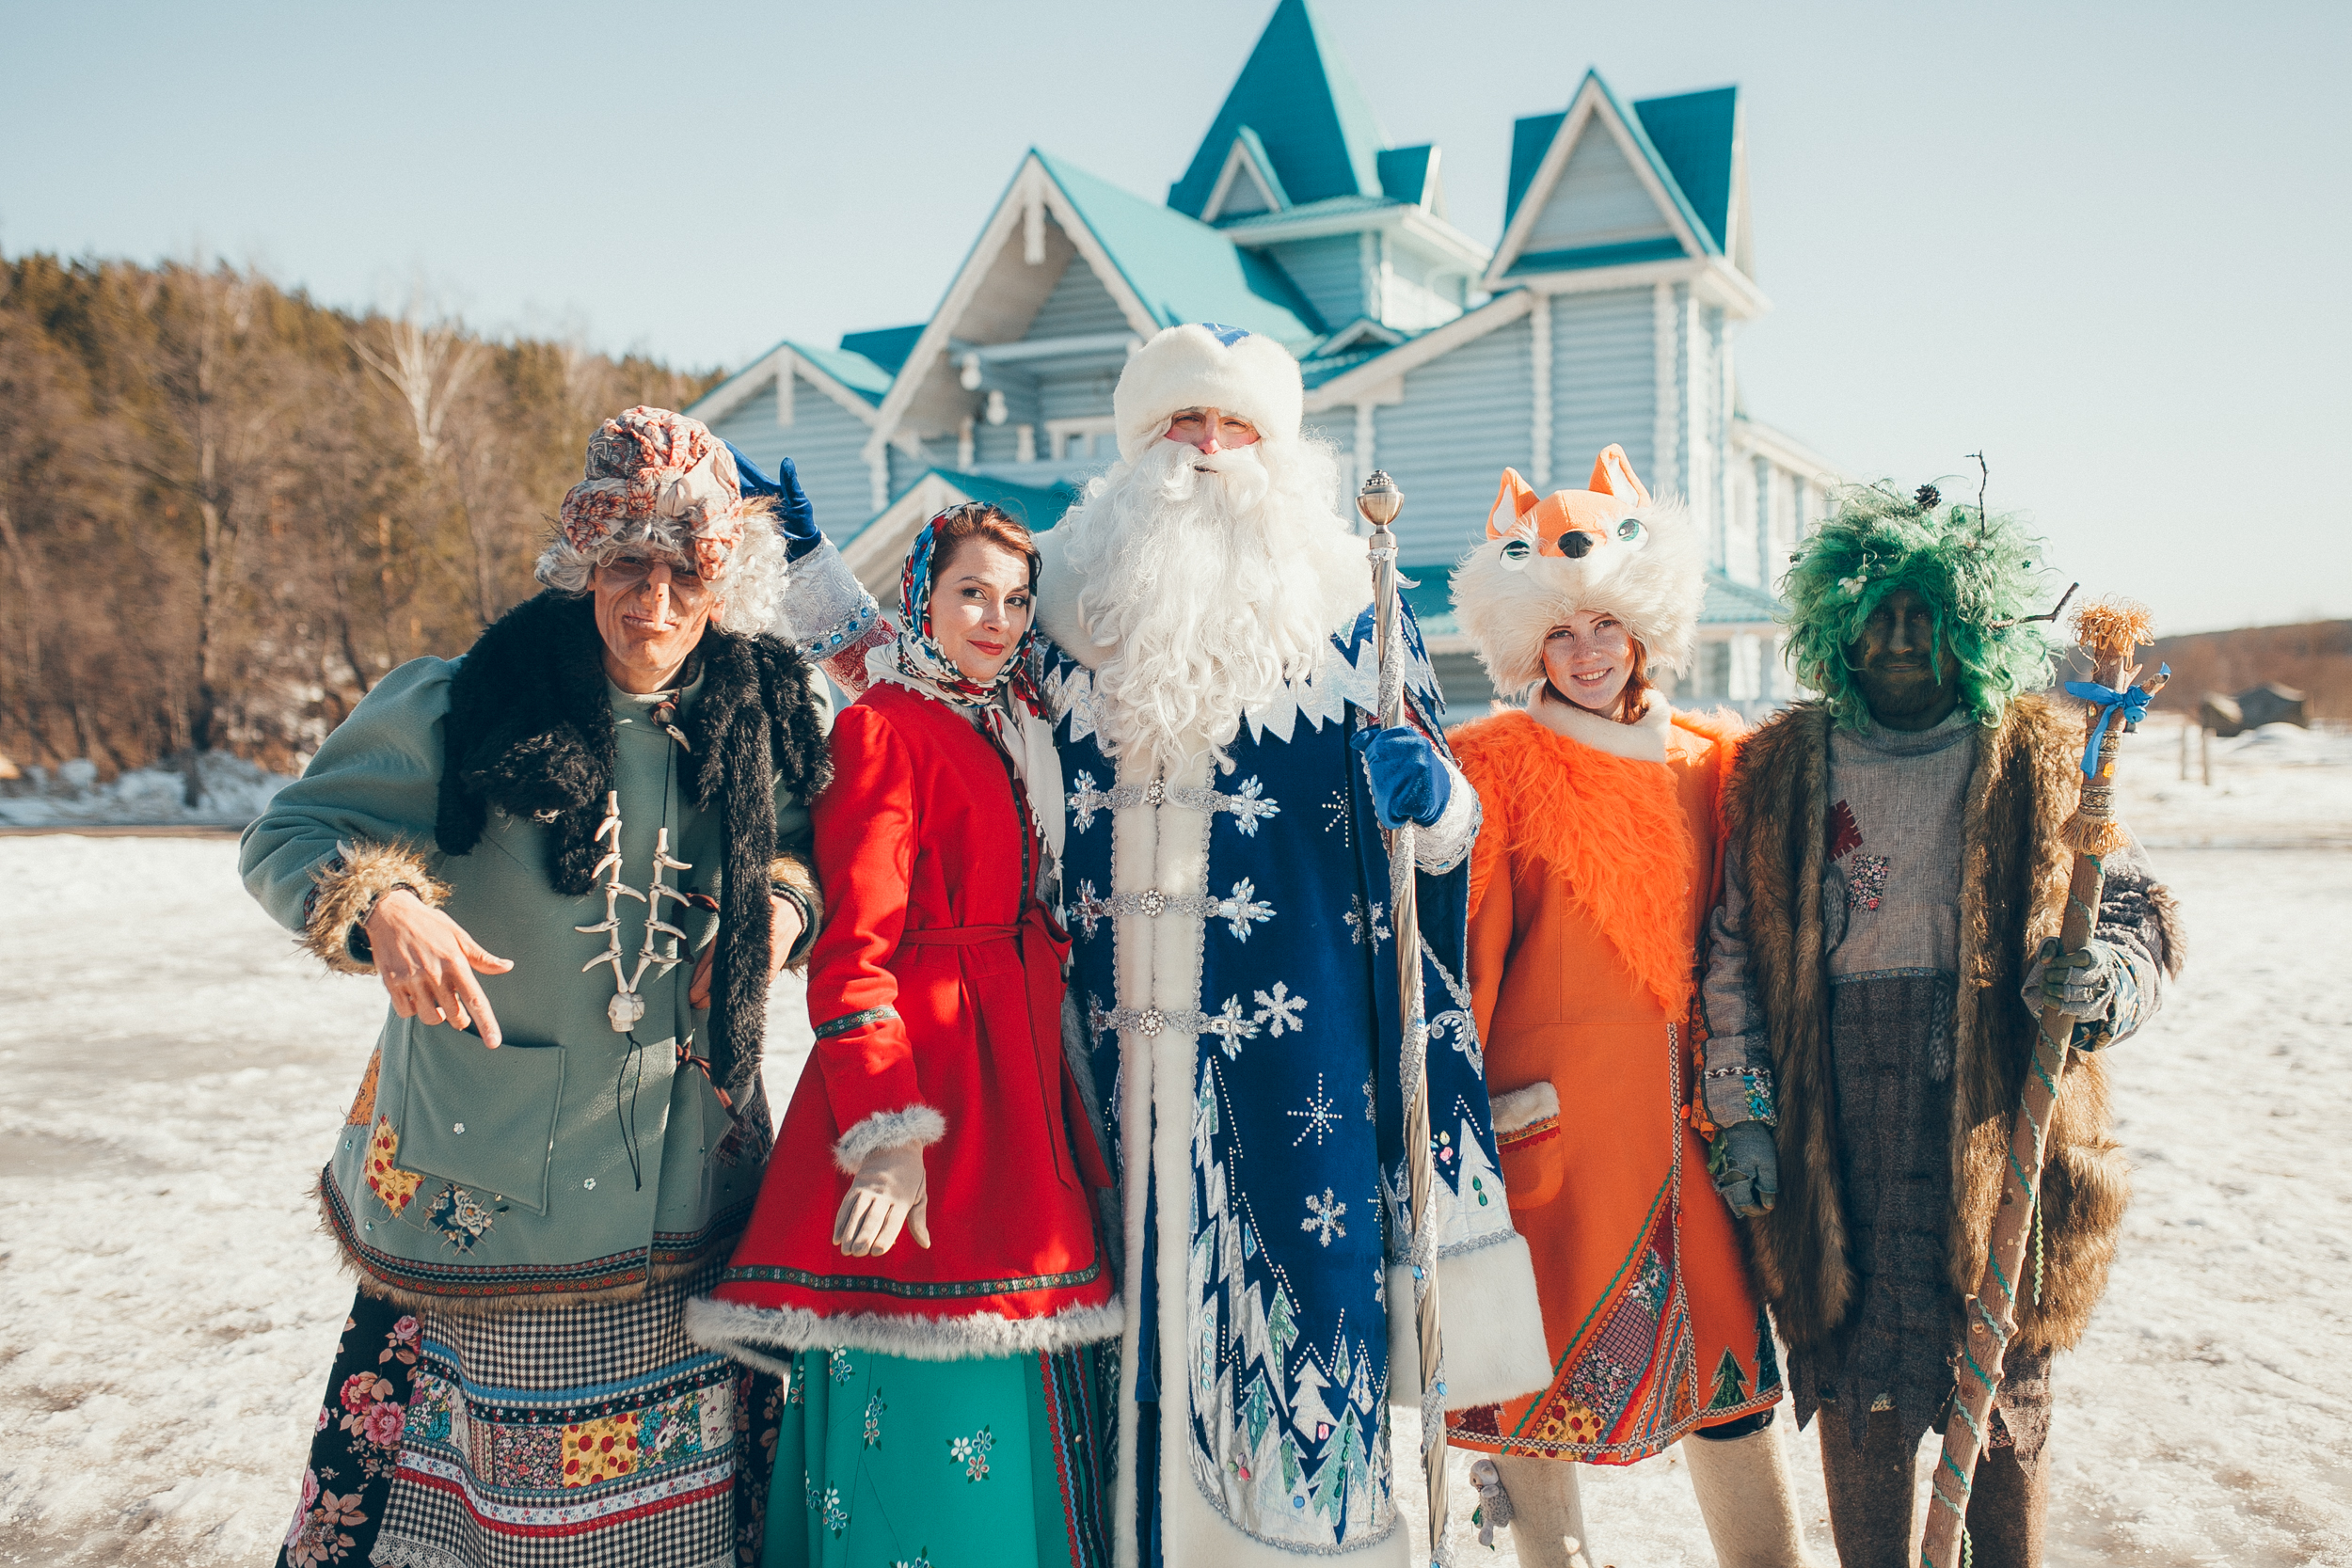 Фото с волшебниками предоставлено организаторами